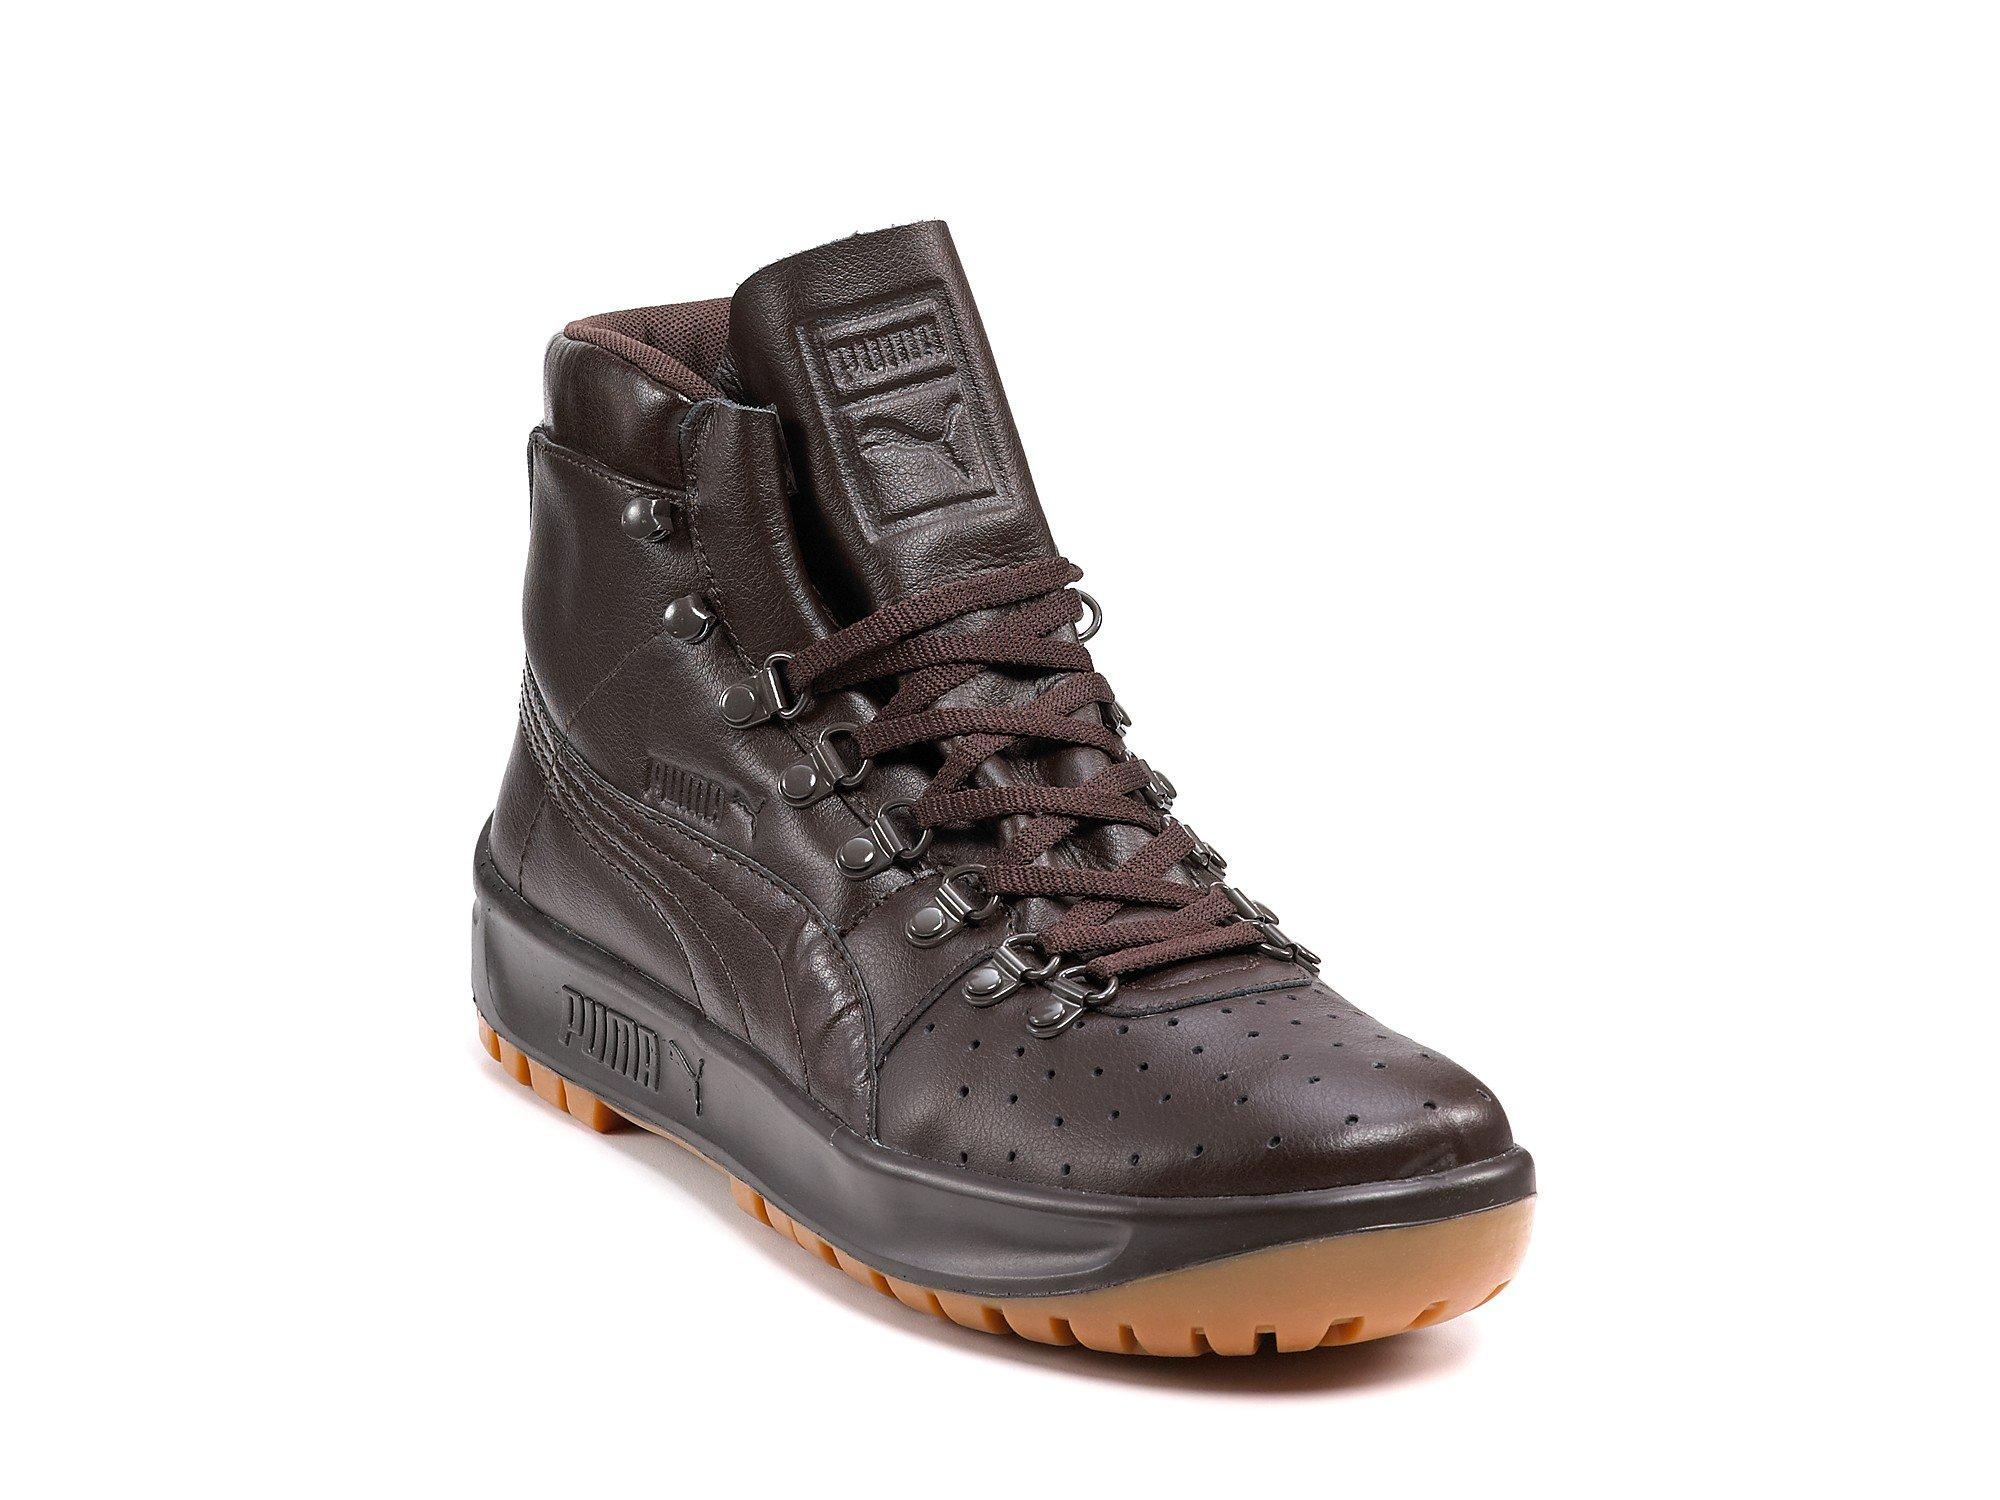 PUMA Gv Alpine Wtr L Sneakers in Brown for Men - Lyst